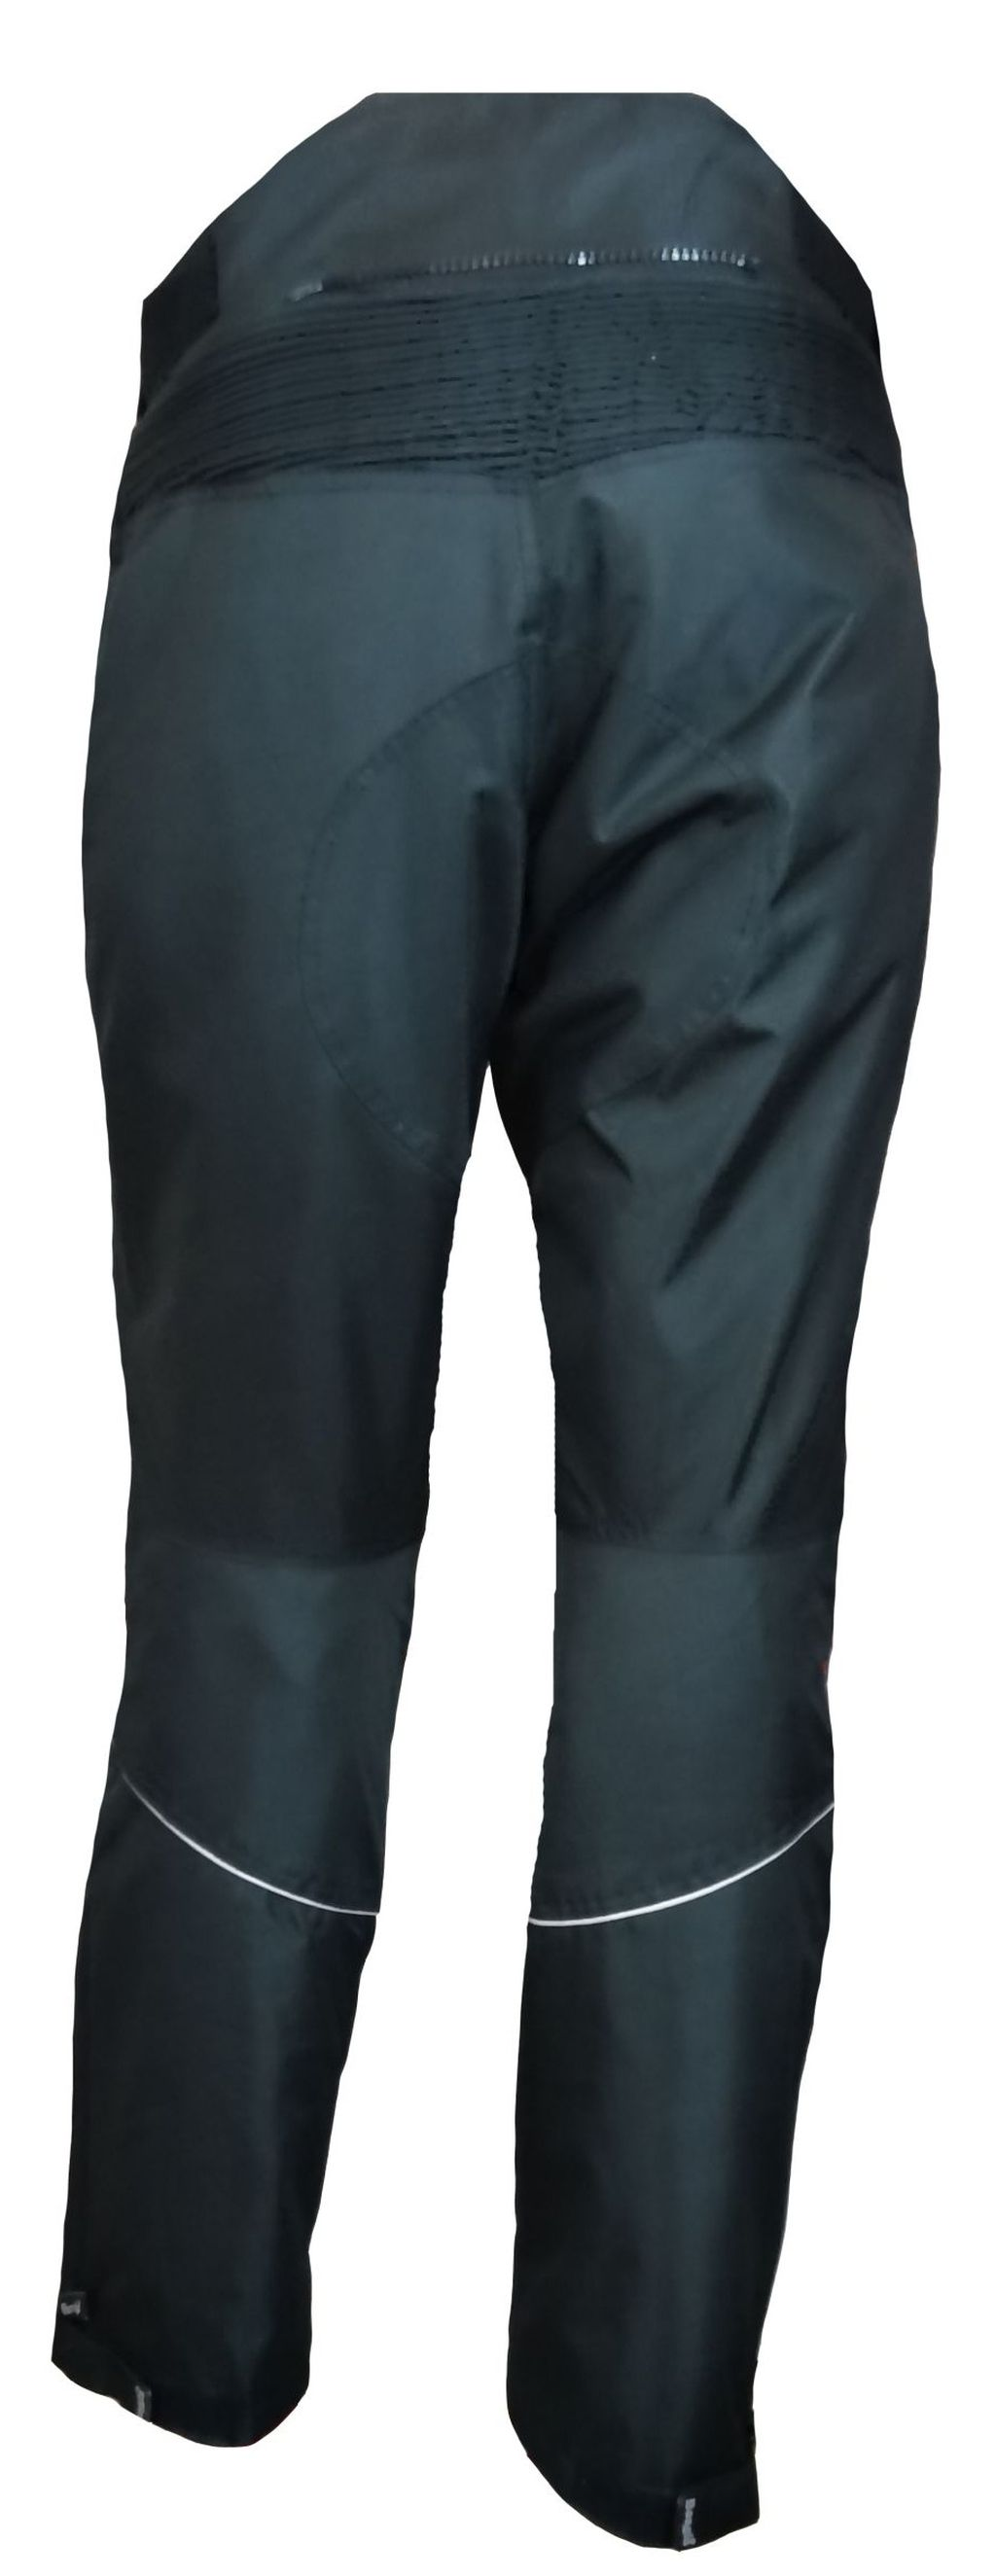 Bangla Motorrad Hose Motorradhose Cordura Textil schwarz weiss rot S - 6 XL